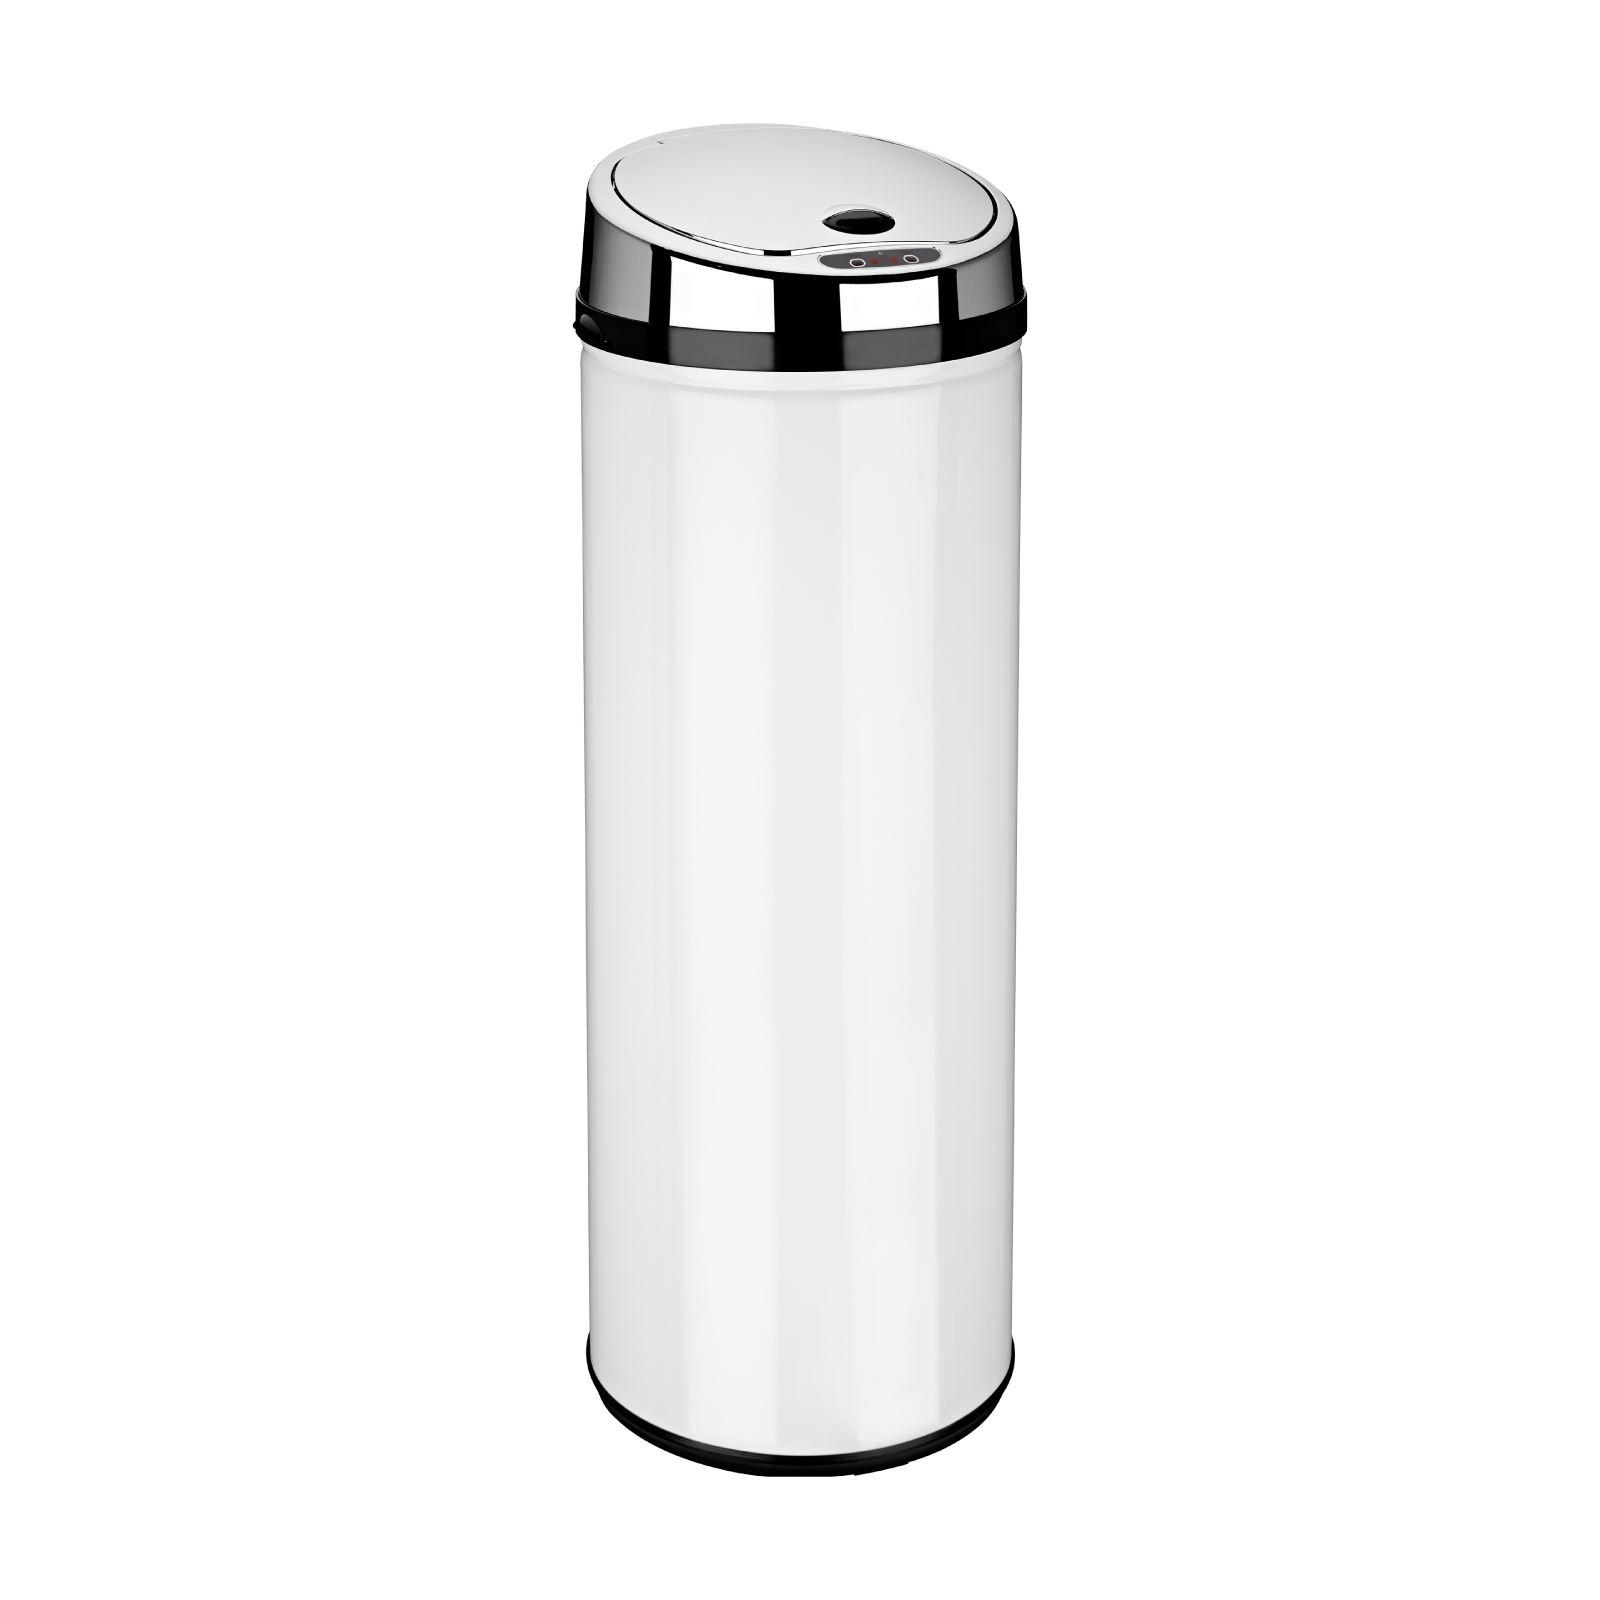 red kitchen trash can walnut table round white black silver steel sensor waste